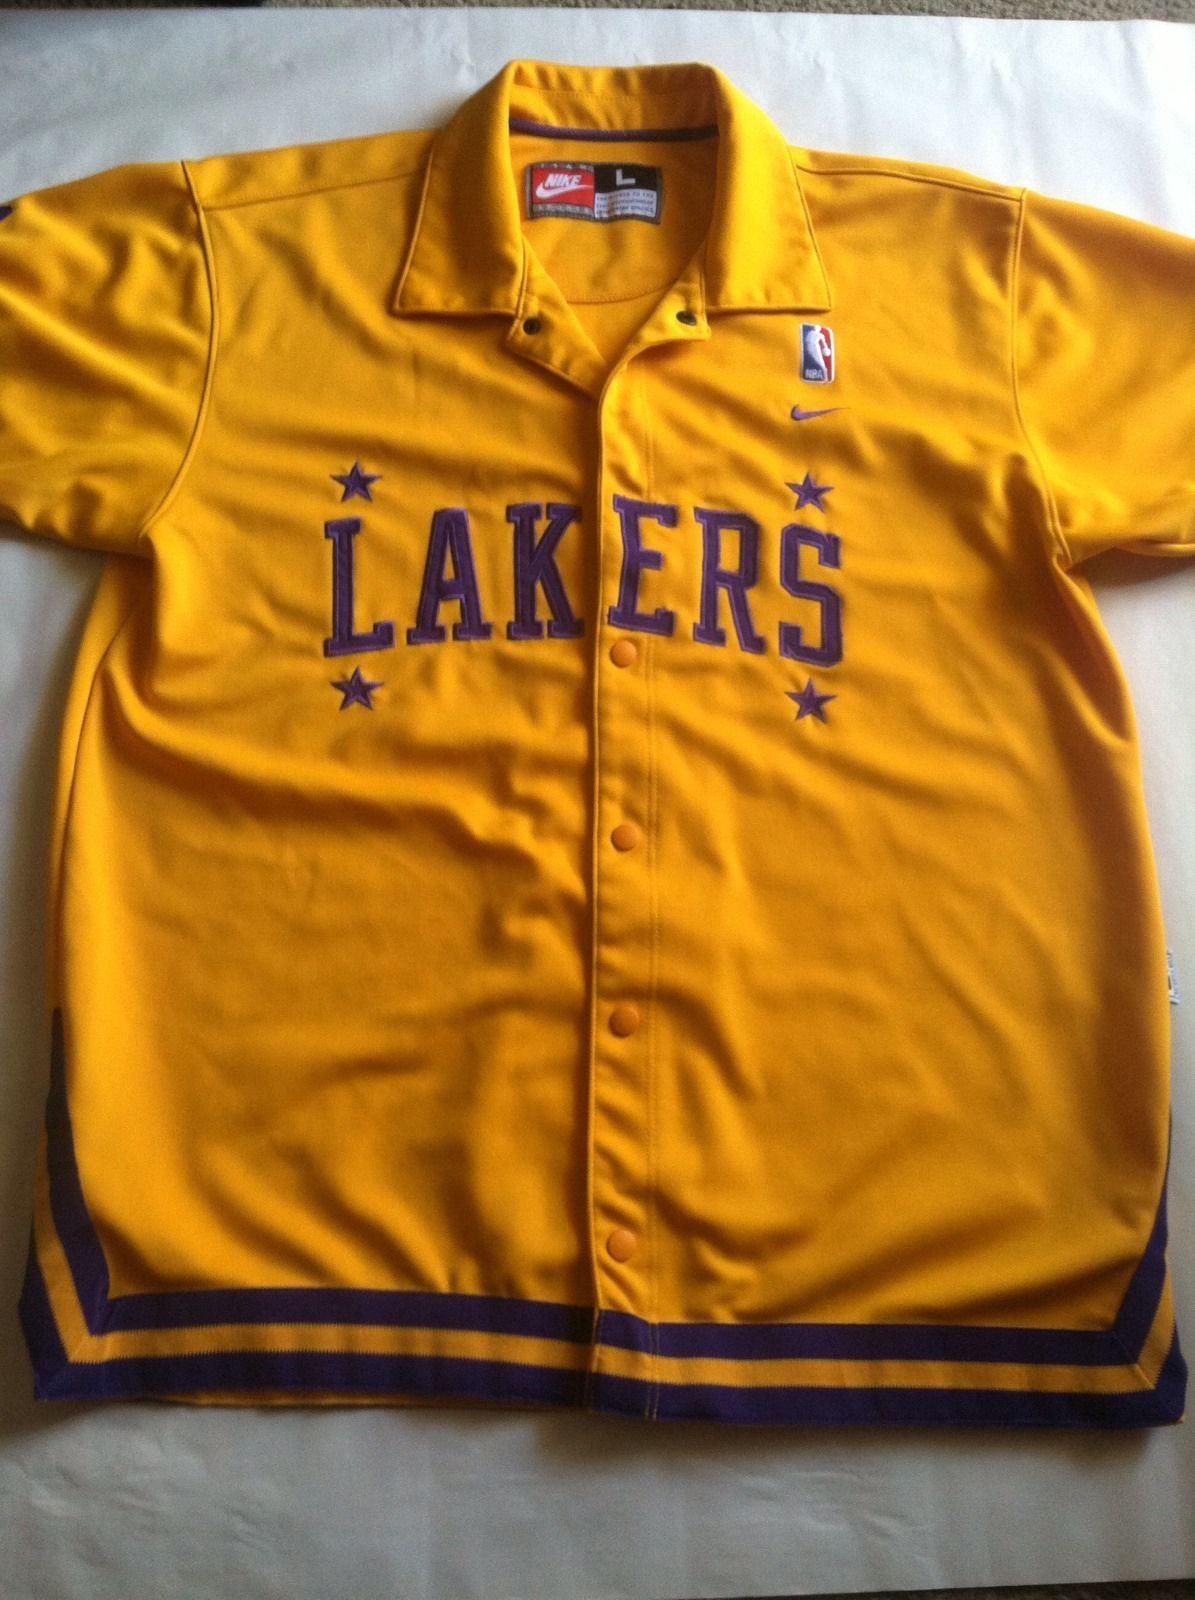 Vtg Los Angeles Lakers Nike Rewind 57 Nba Sewn Warmup Shooting Jersey Shirt L Jersey Shirt Los Angeles Lakers Lakers